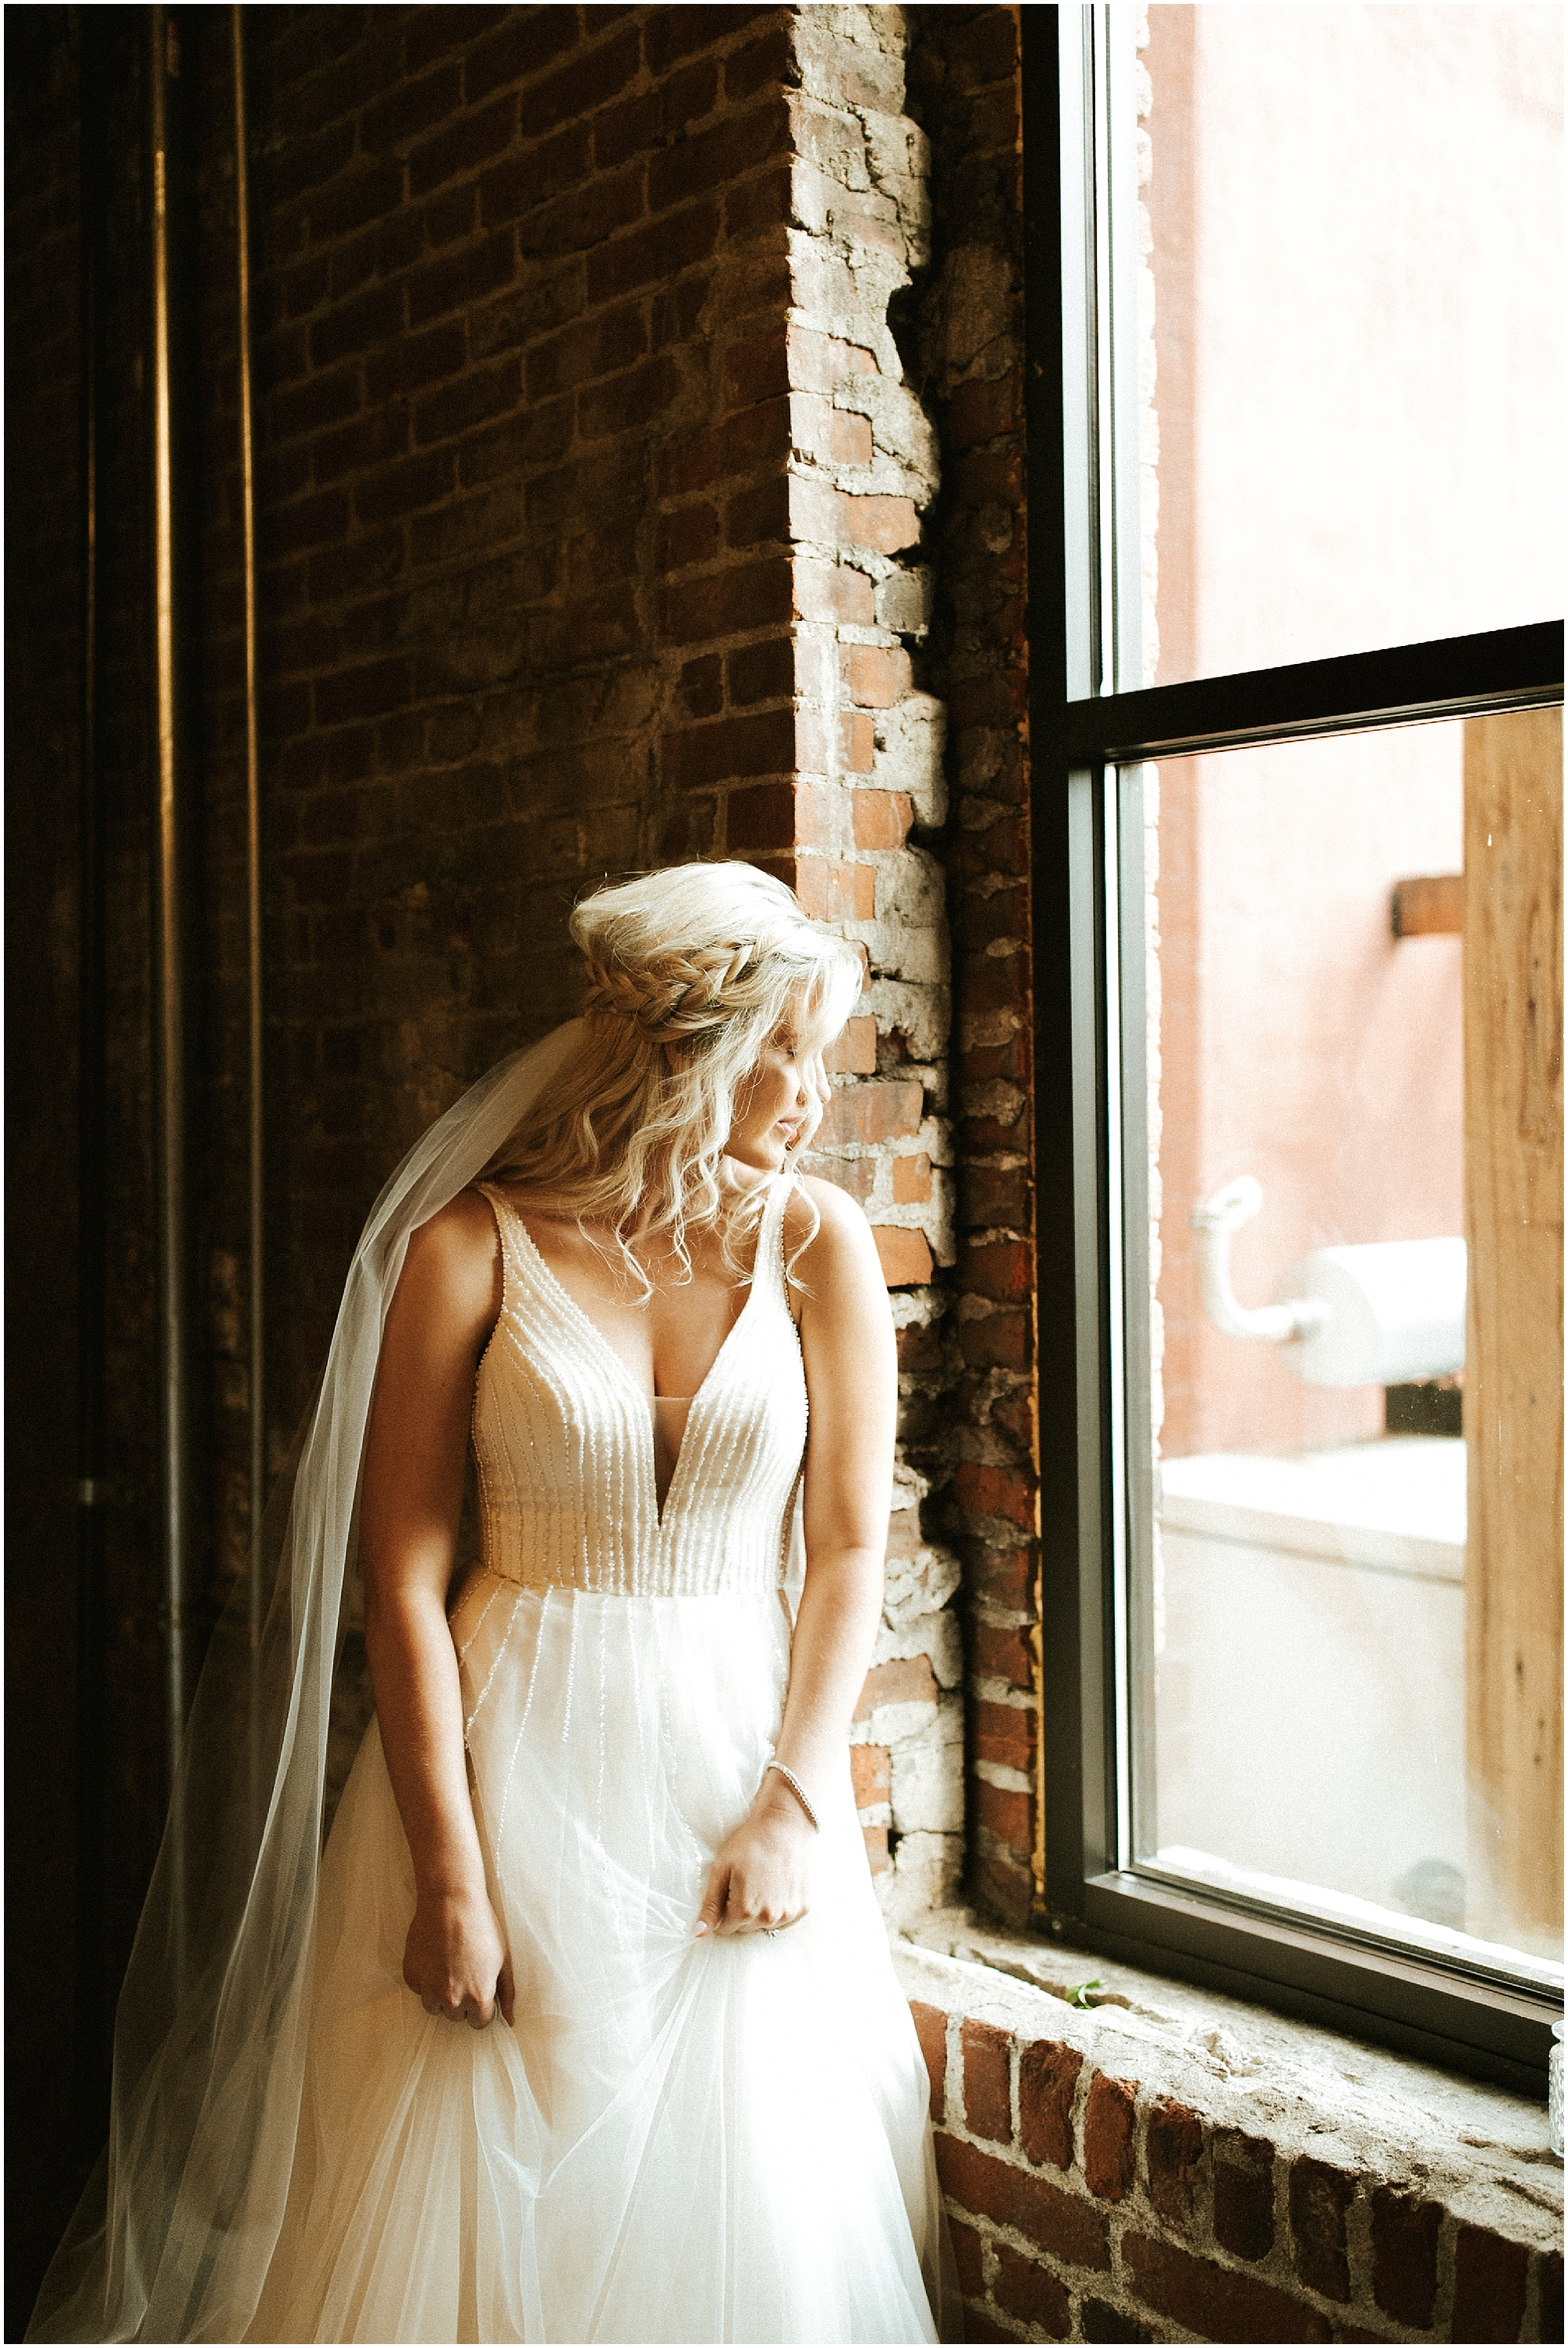 Chateau Rive Spokane Wedding Cassie Trottier Photography1013.jpg